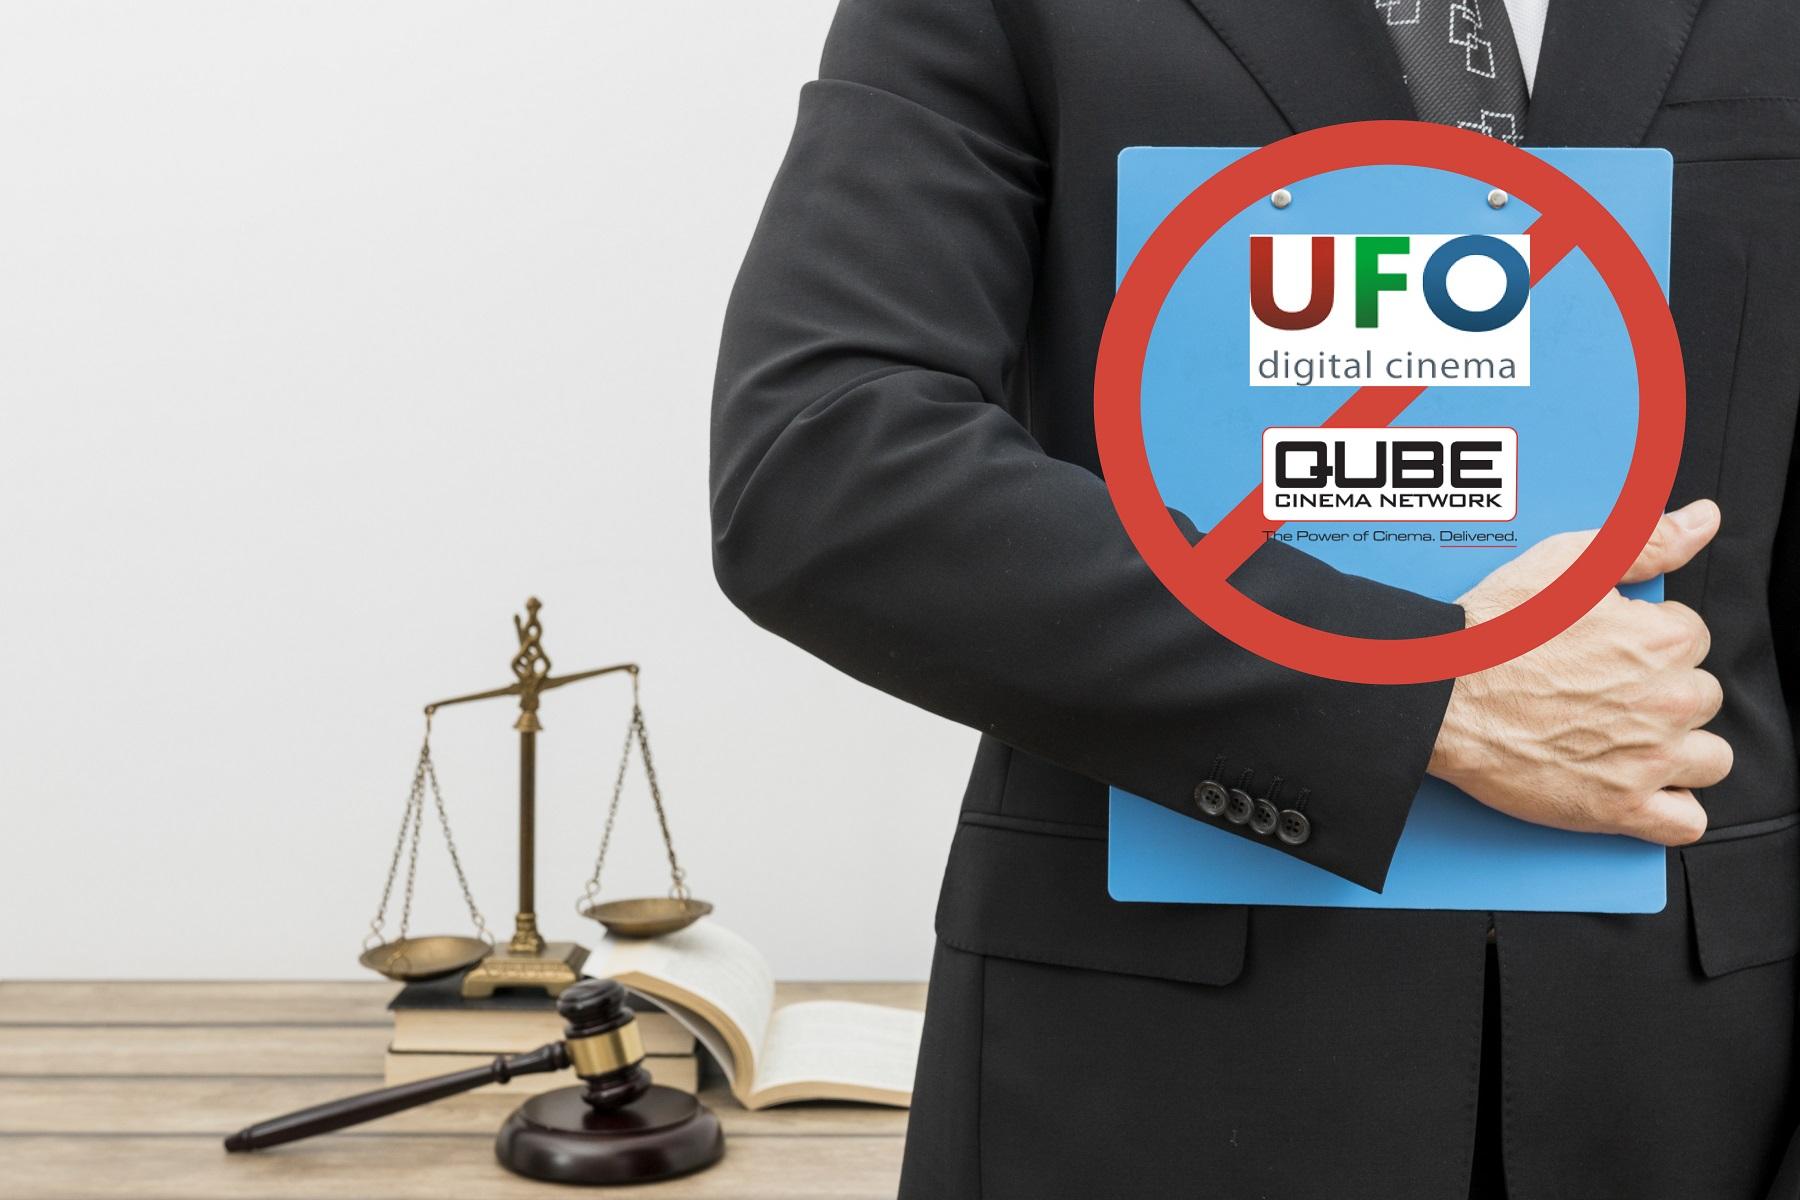 UFO-Moviez-Qube-Merger-NCLT-Dismissed